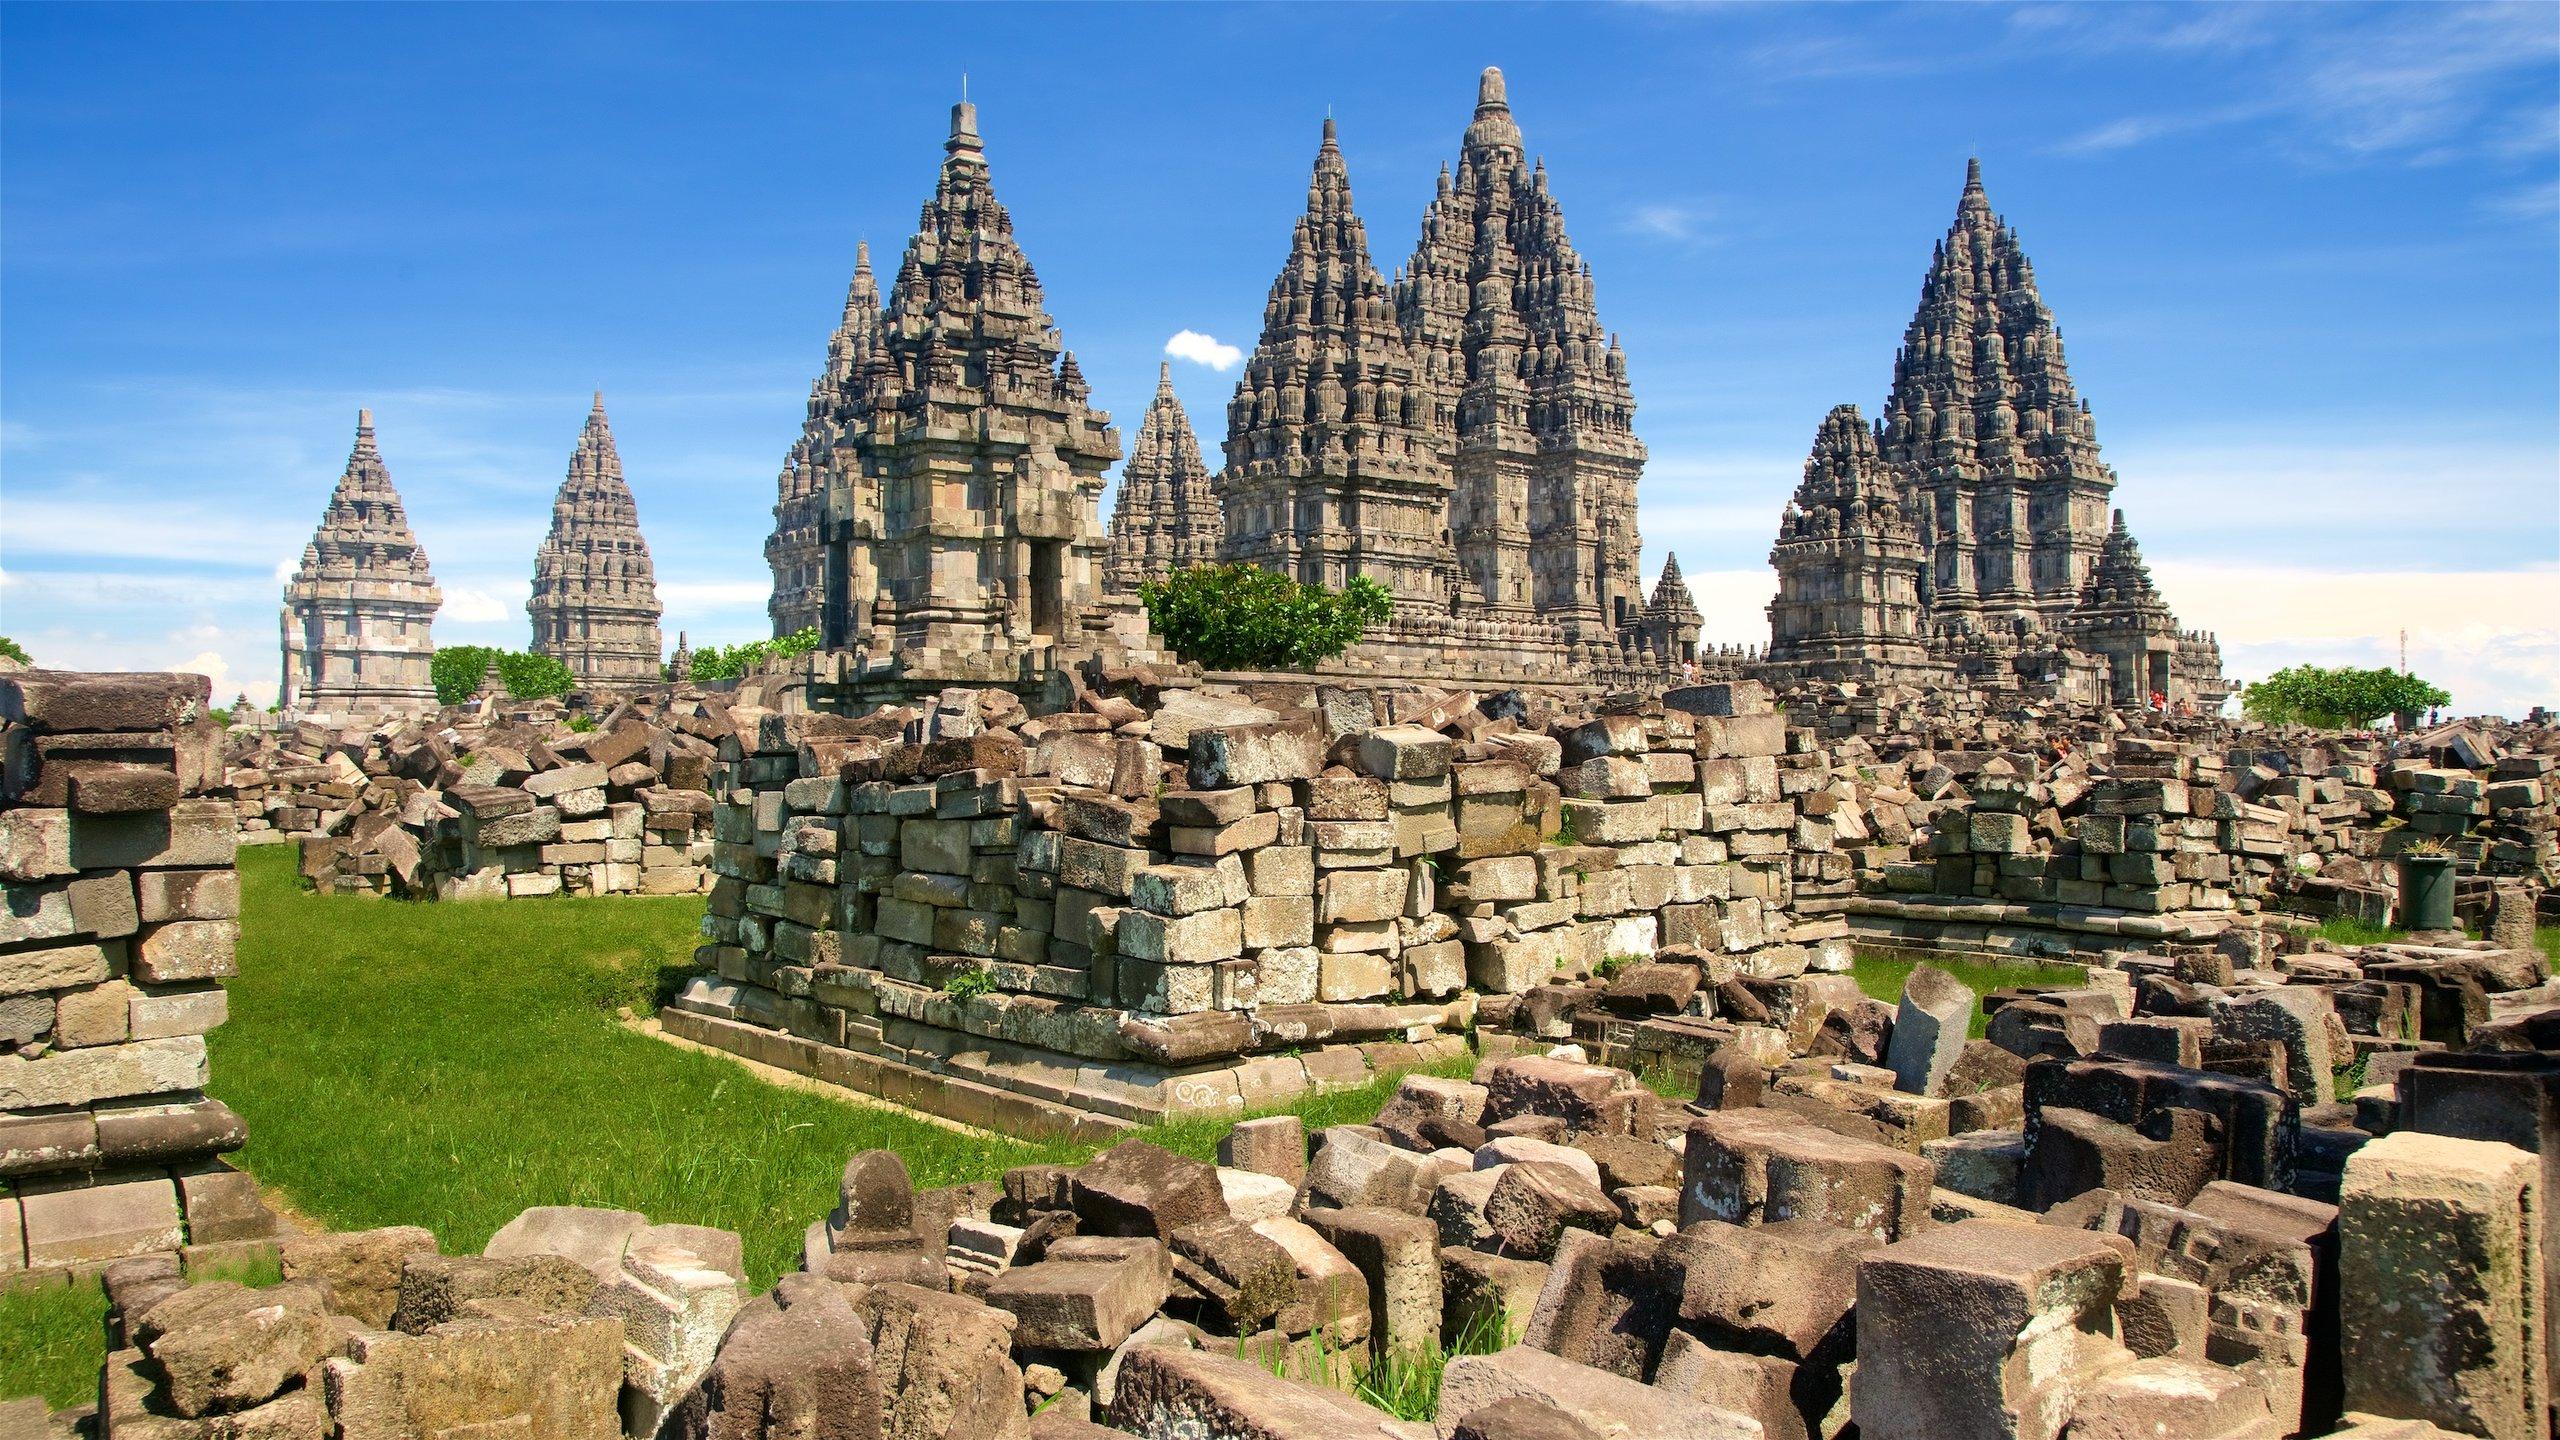 Prambanan Temple, Prambanan, Central Java, Indonesia